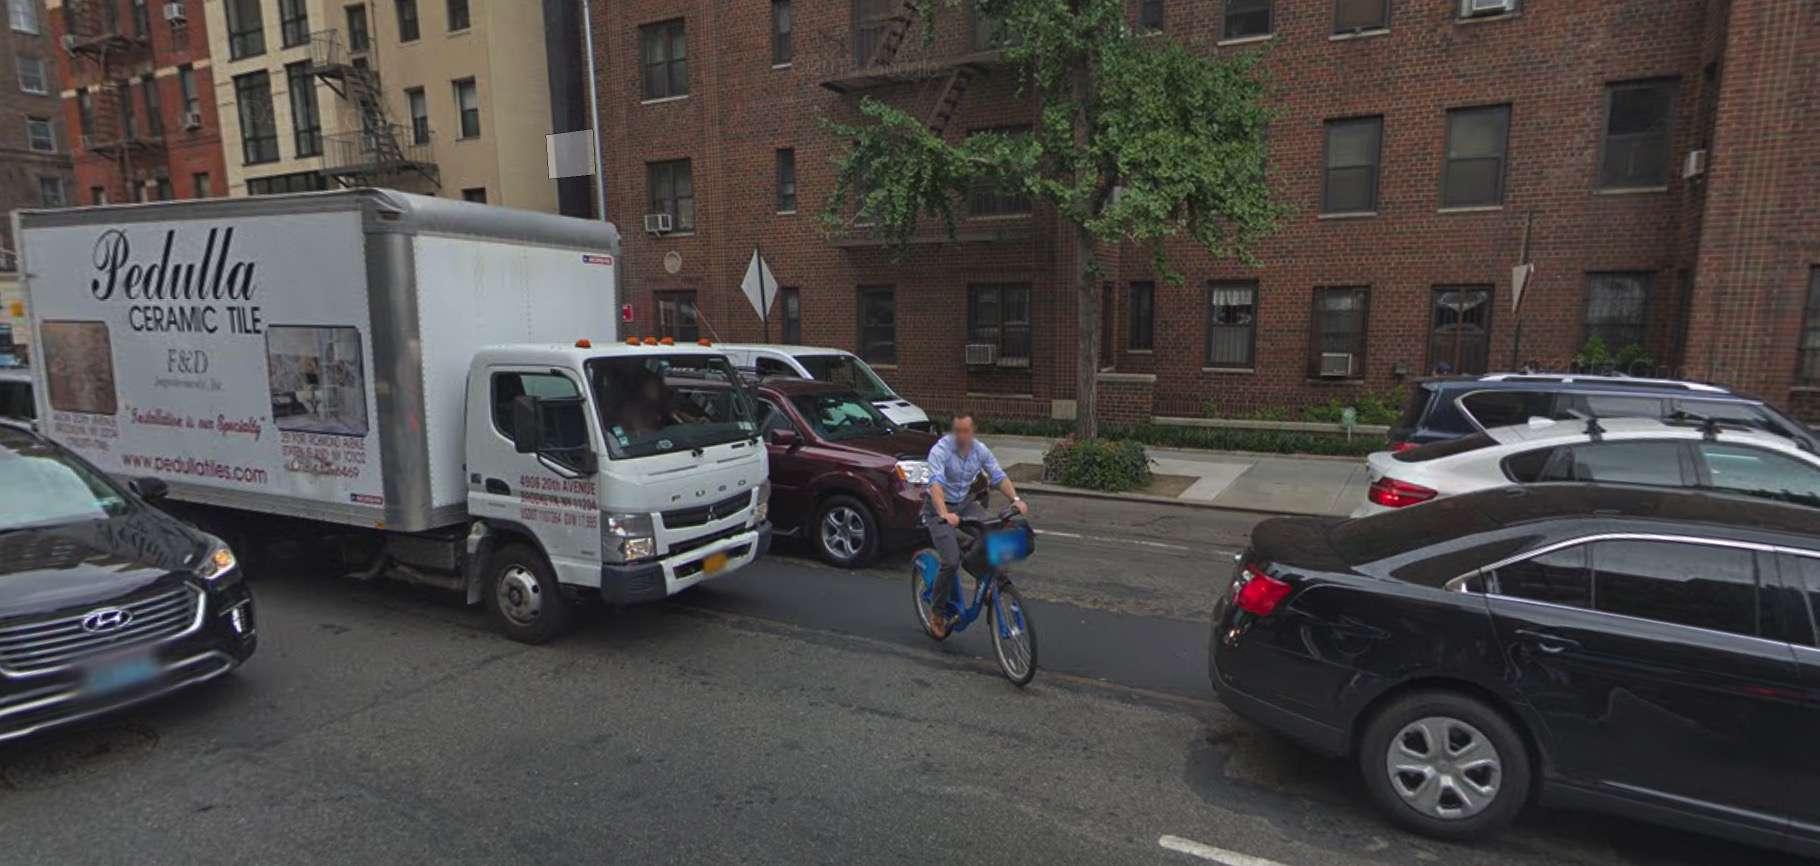 What happens when 2nd Avenue bike lane turns to sharrows